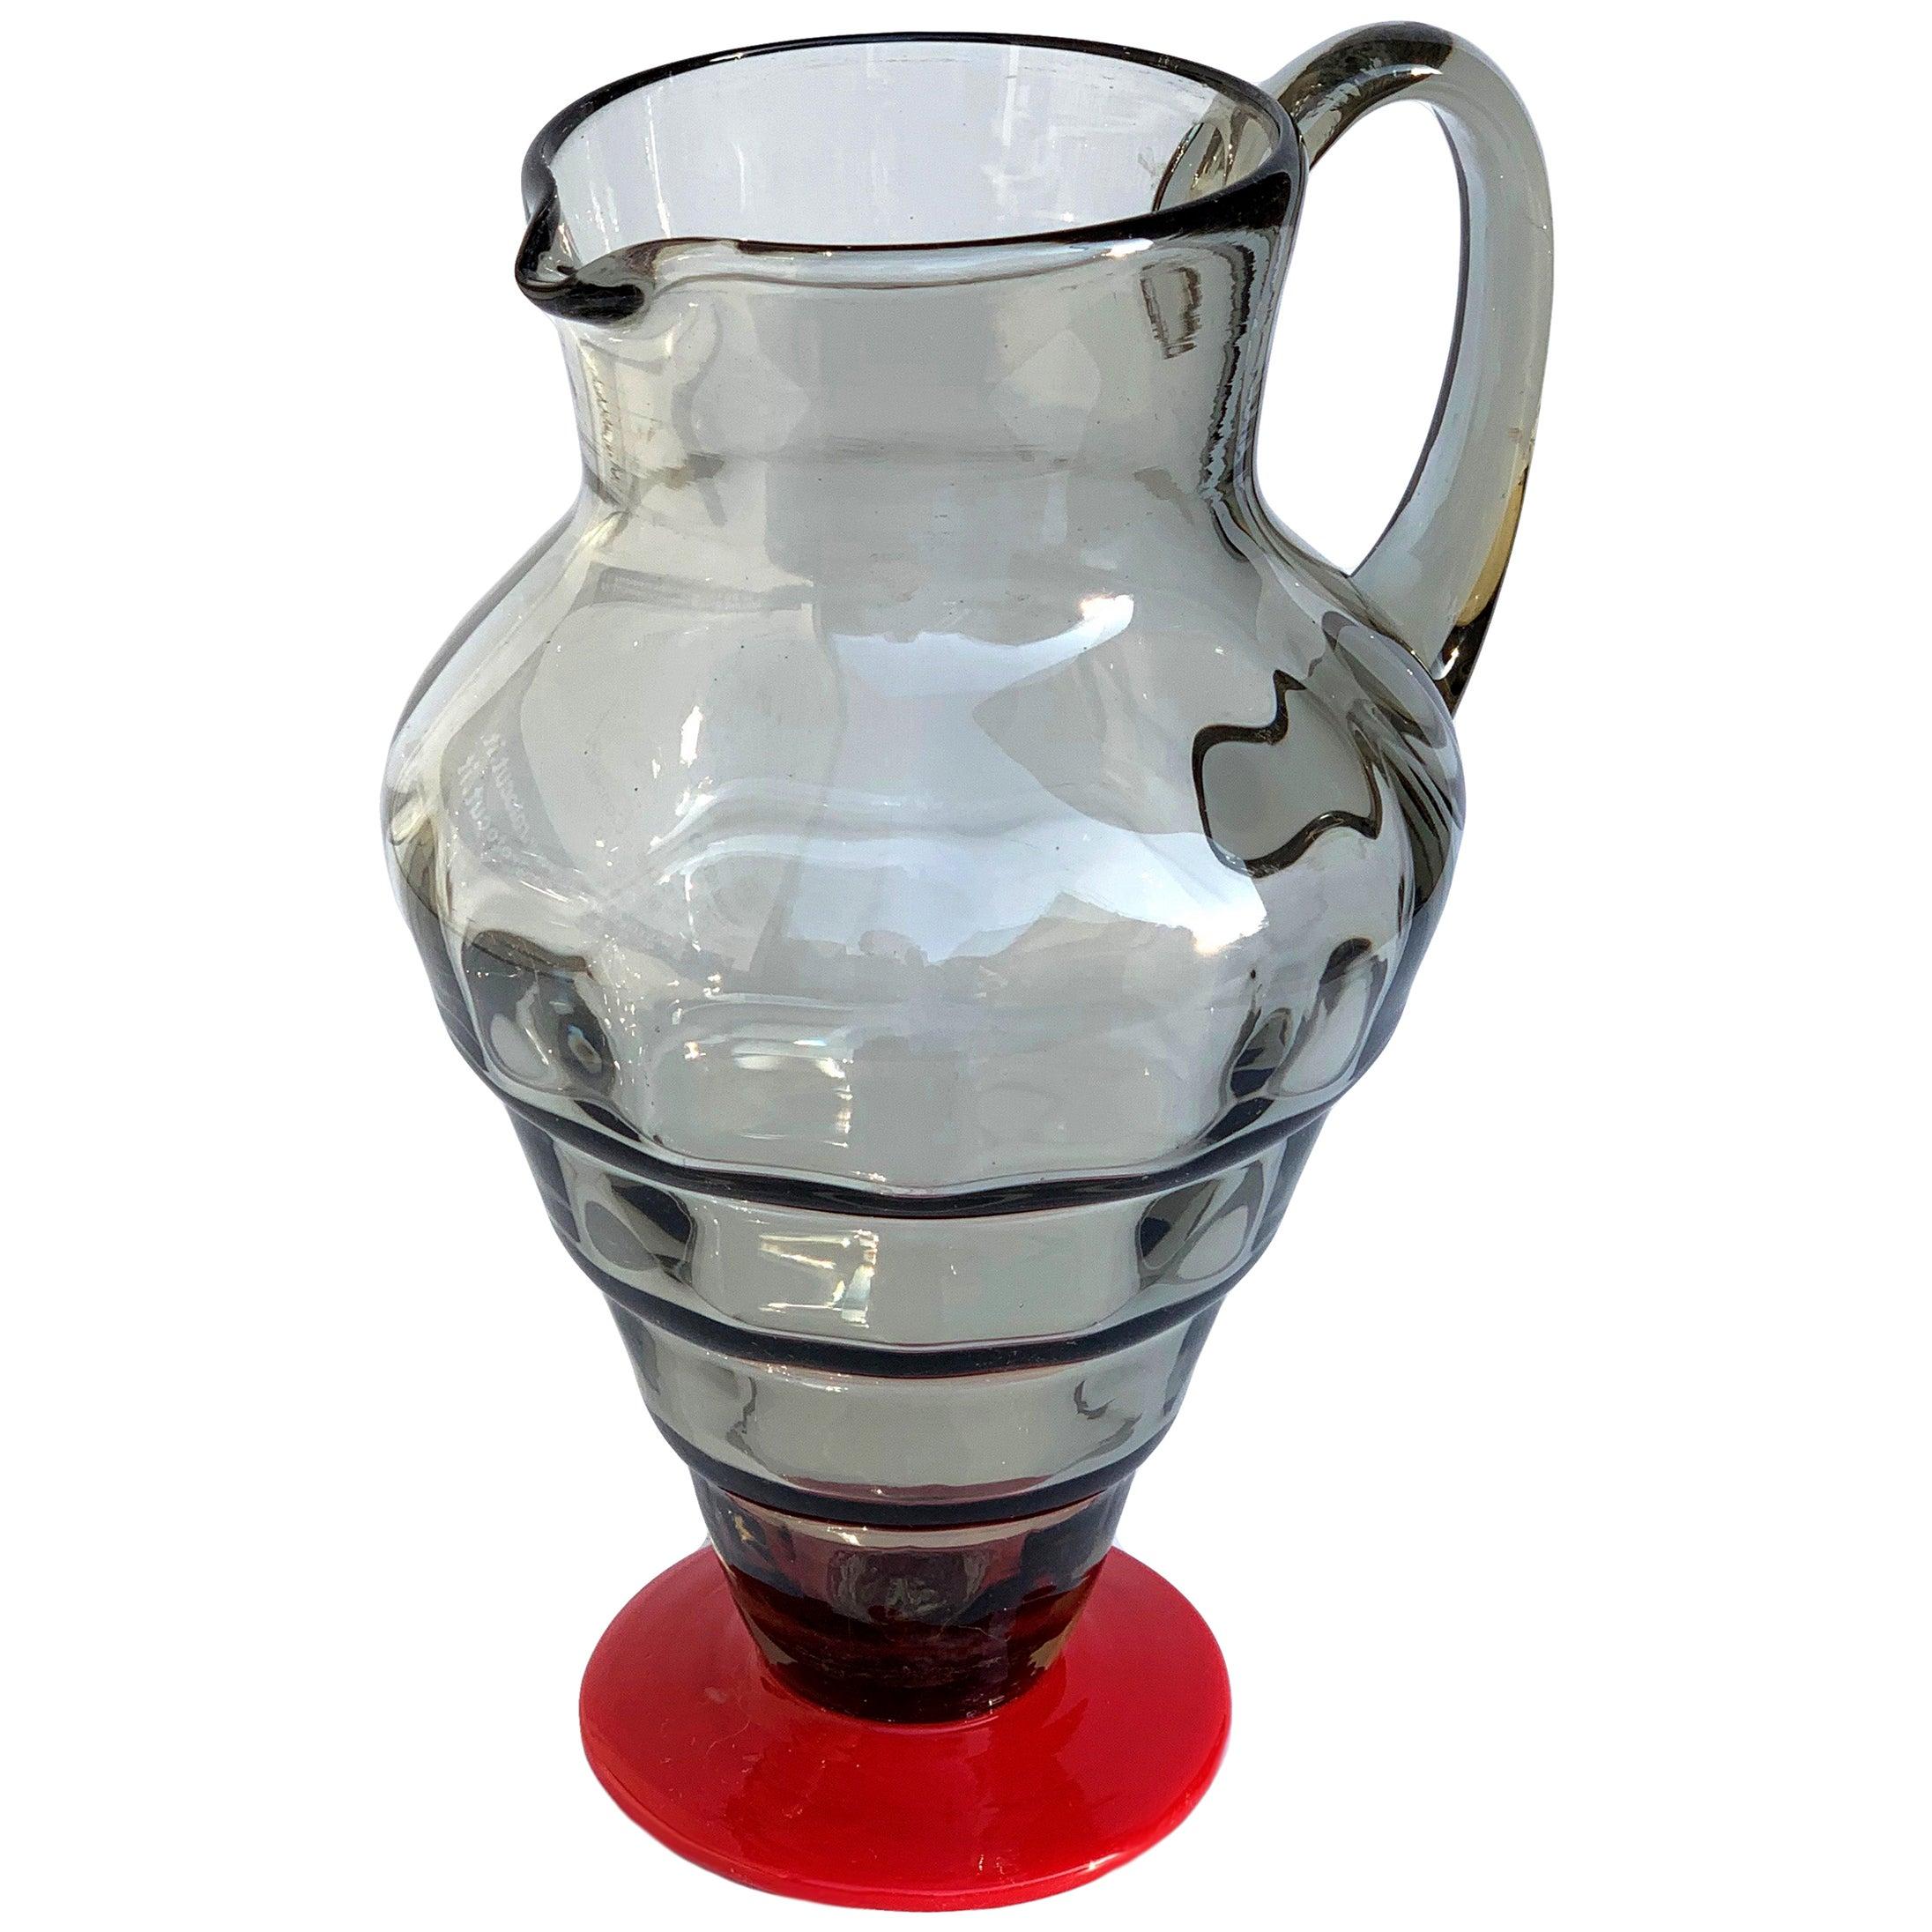 Napoleone Martinuzzi Smoked Glass and Red Glass for Venini Italian Carafe, 1930s